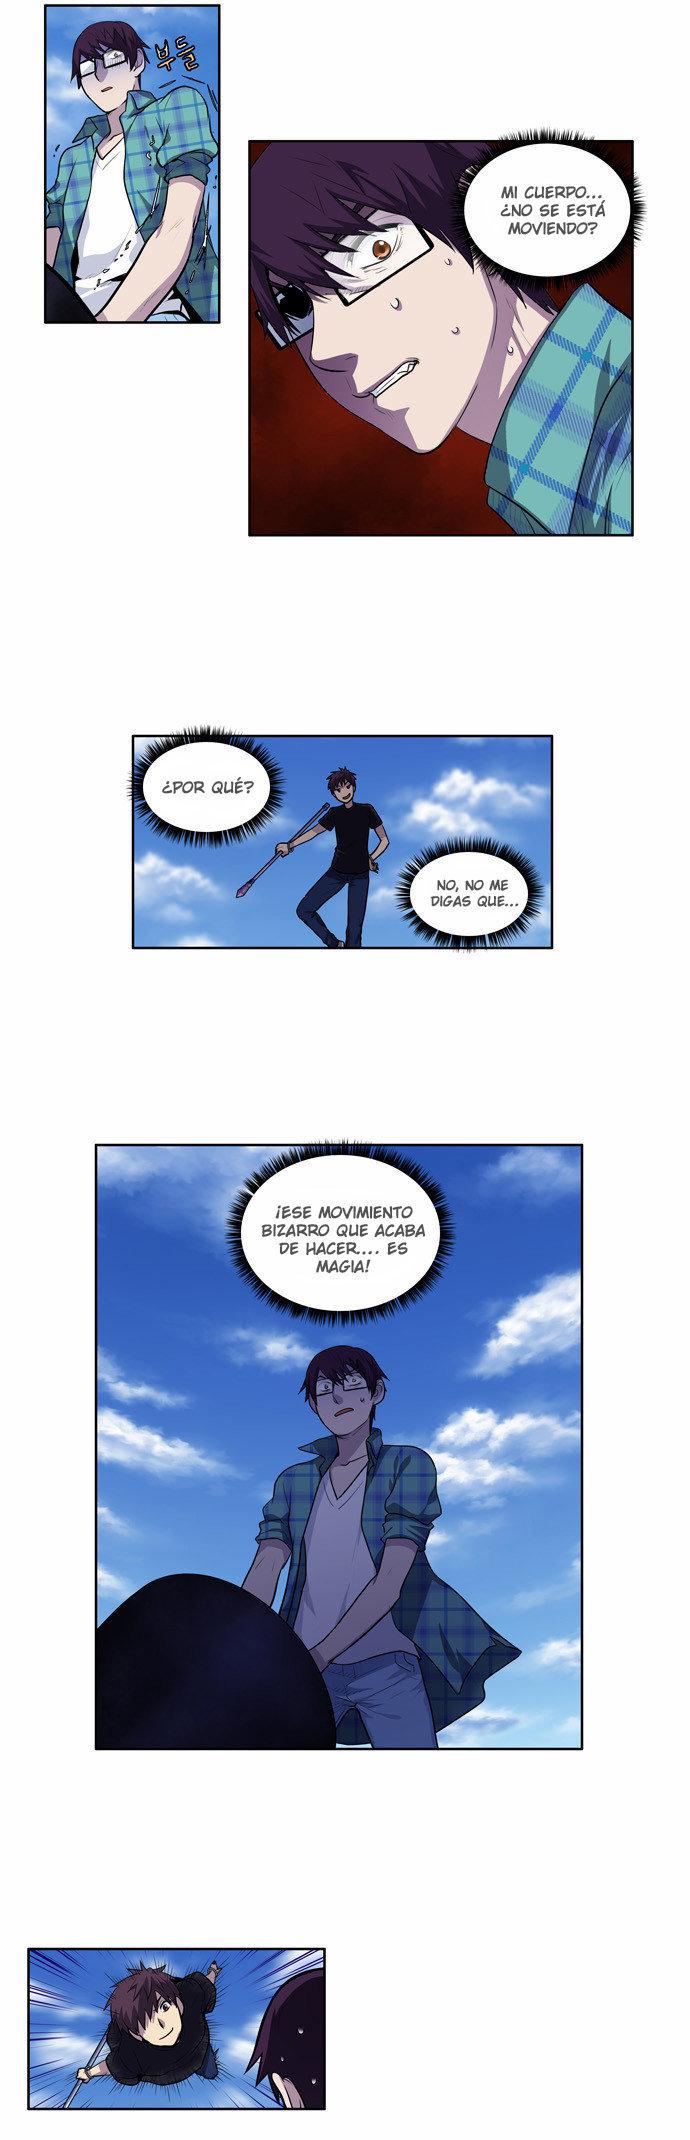 https://c5.ninemanga.com/es_manga/61/1725/442818/202f46e749ba97e38bb0cd9aca4ca010.jpg Page 6